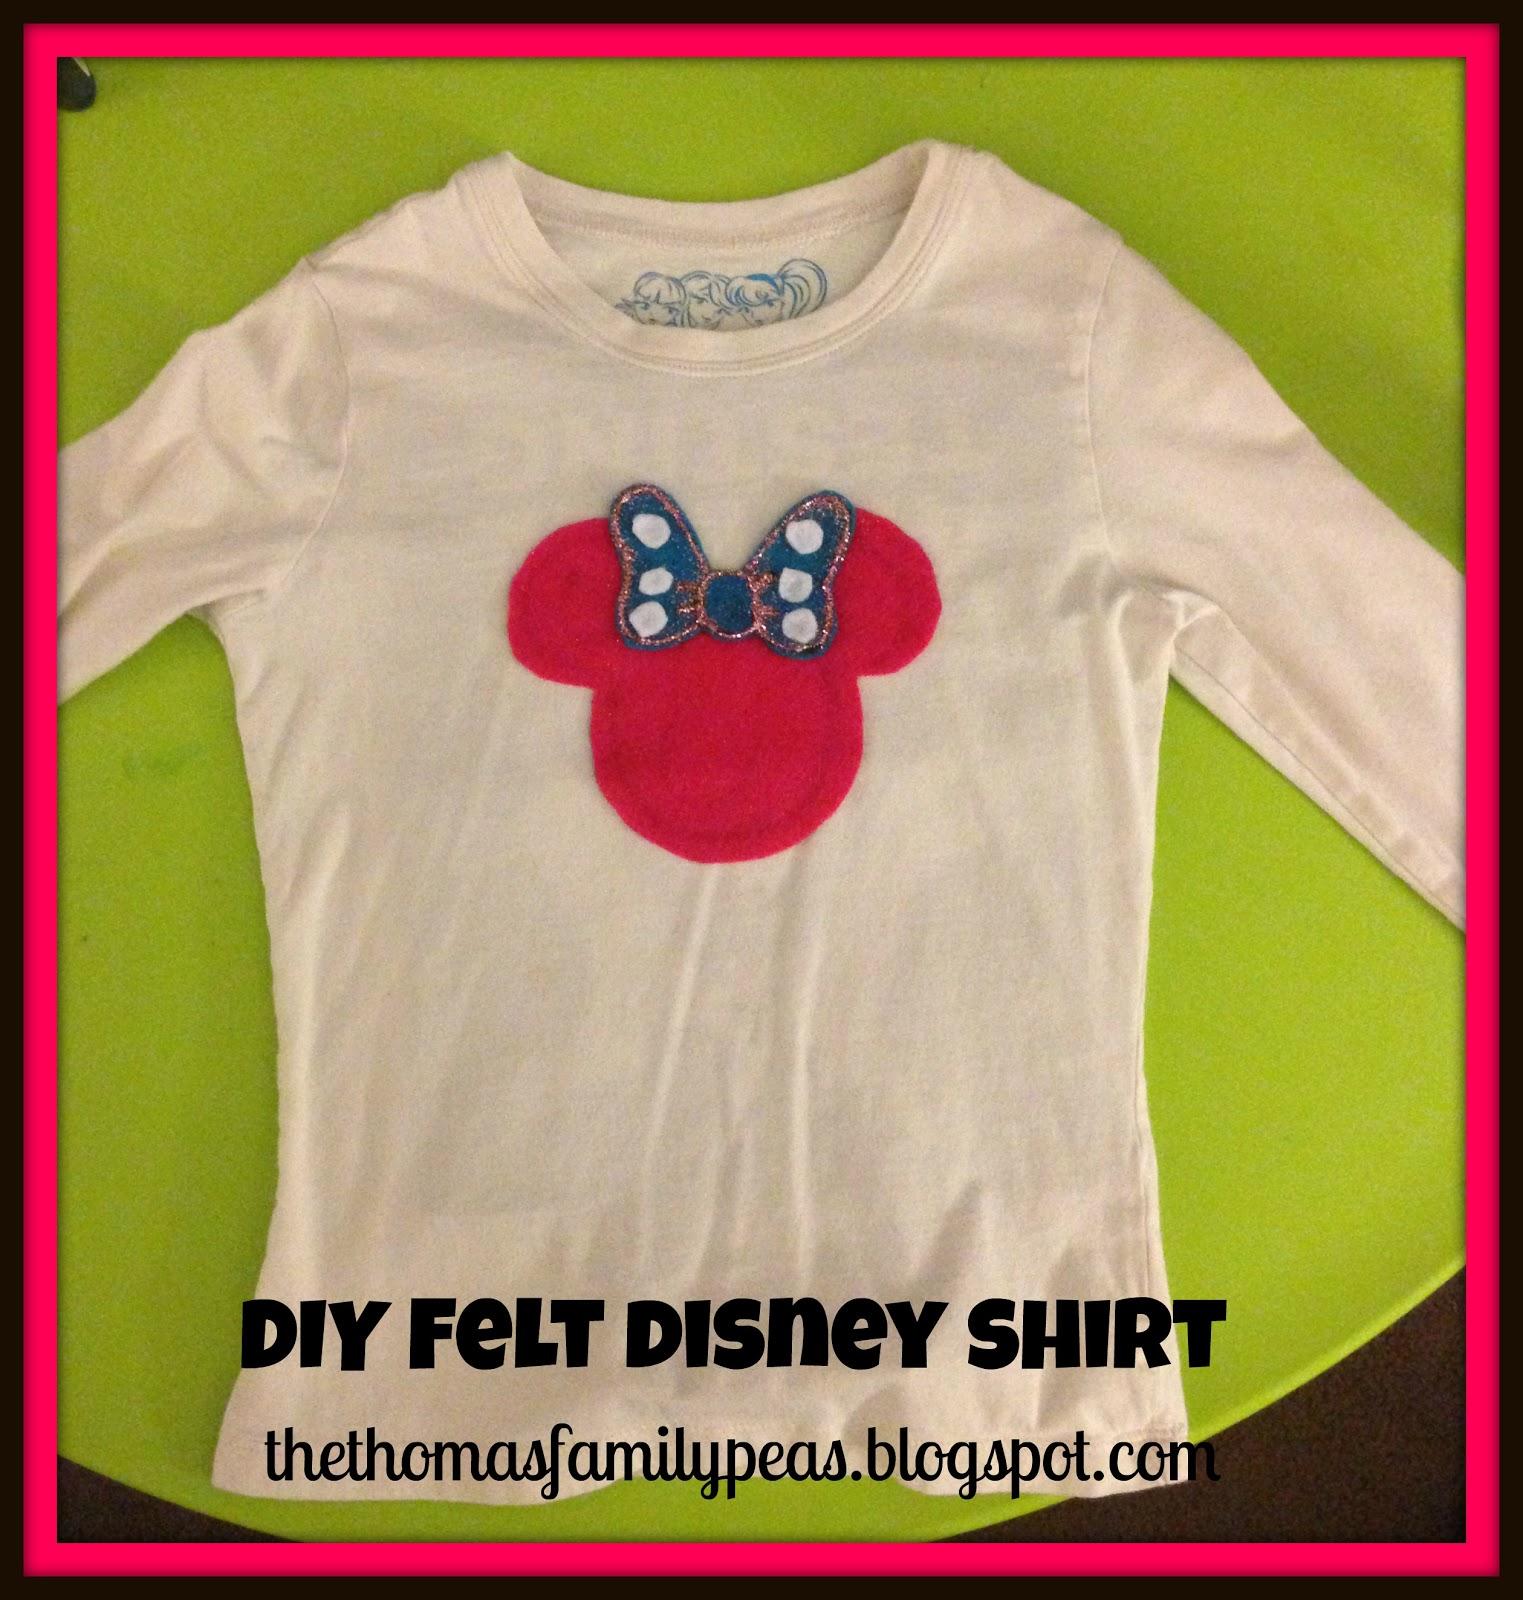 My three peas crazy easy diy felt disney shirt for Diy disney shirt template